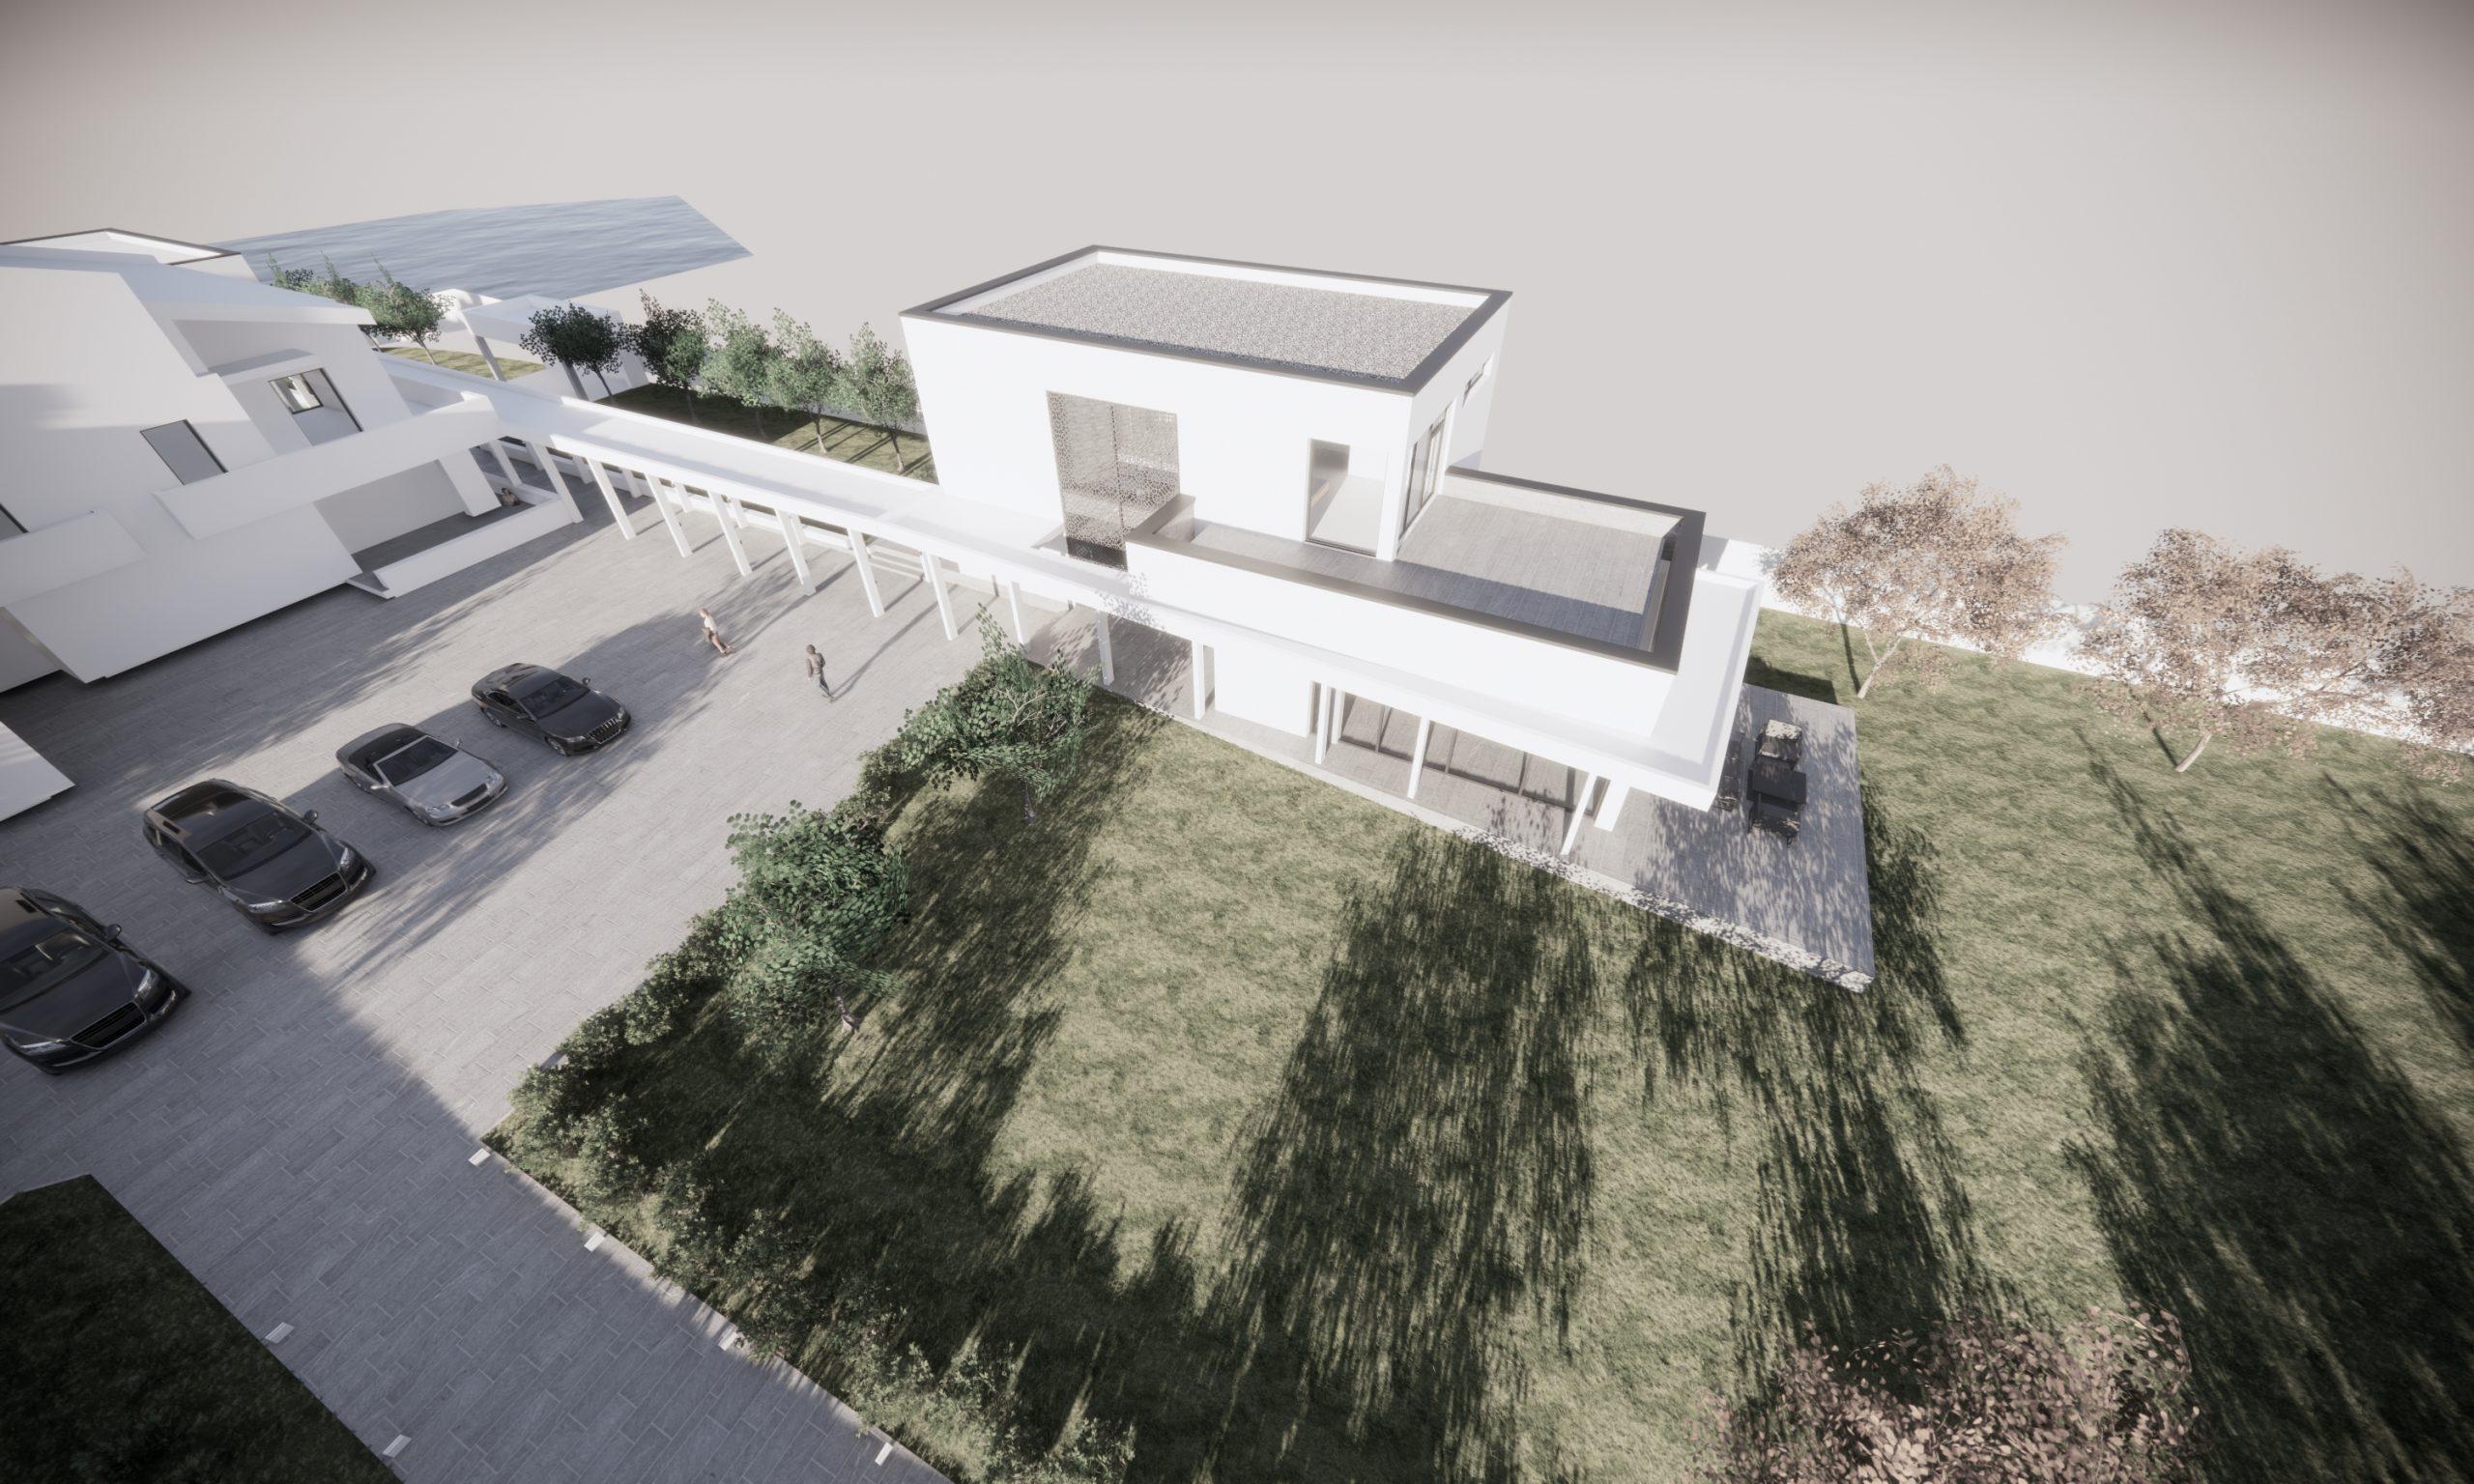 https://nbc-arhitect.ro/wp-content/uploads/2020/11/NBC-Arhitect-_-residential-_-2x-Snagov-_-Snagov-Romania_18-scaled.jpg